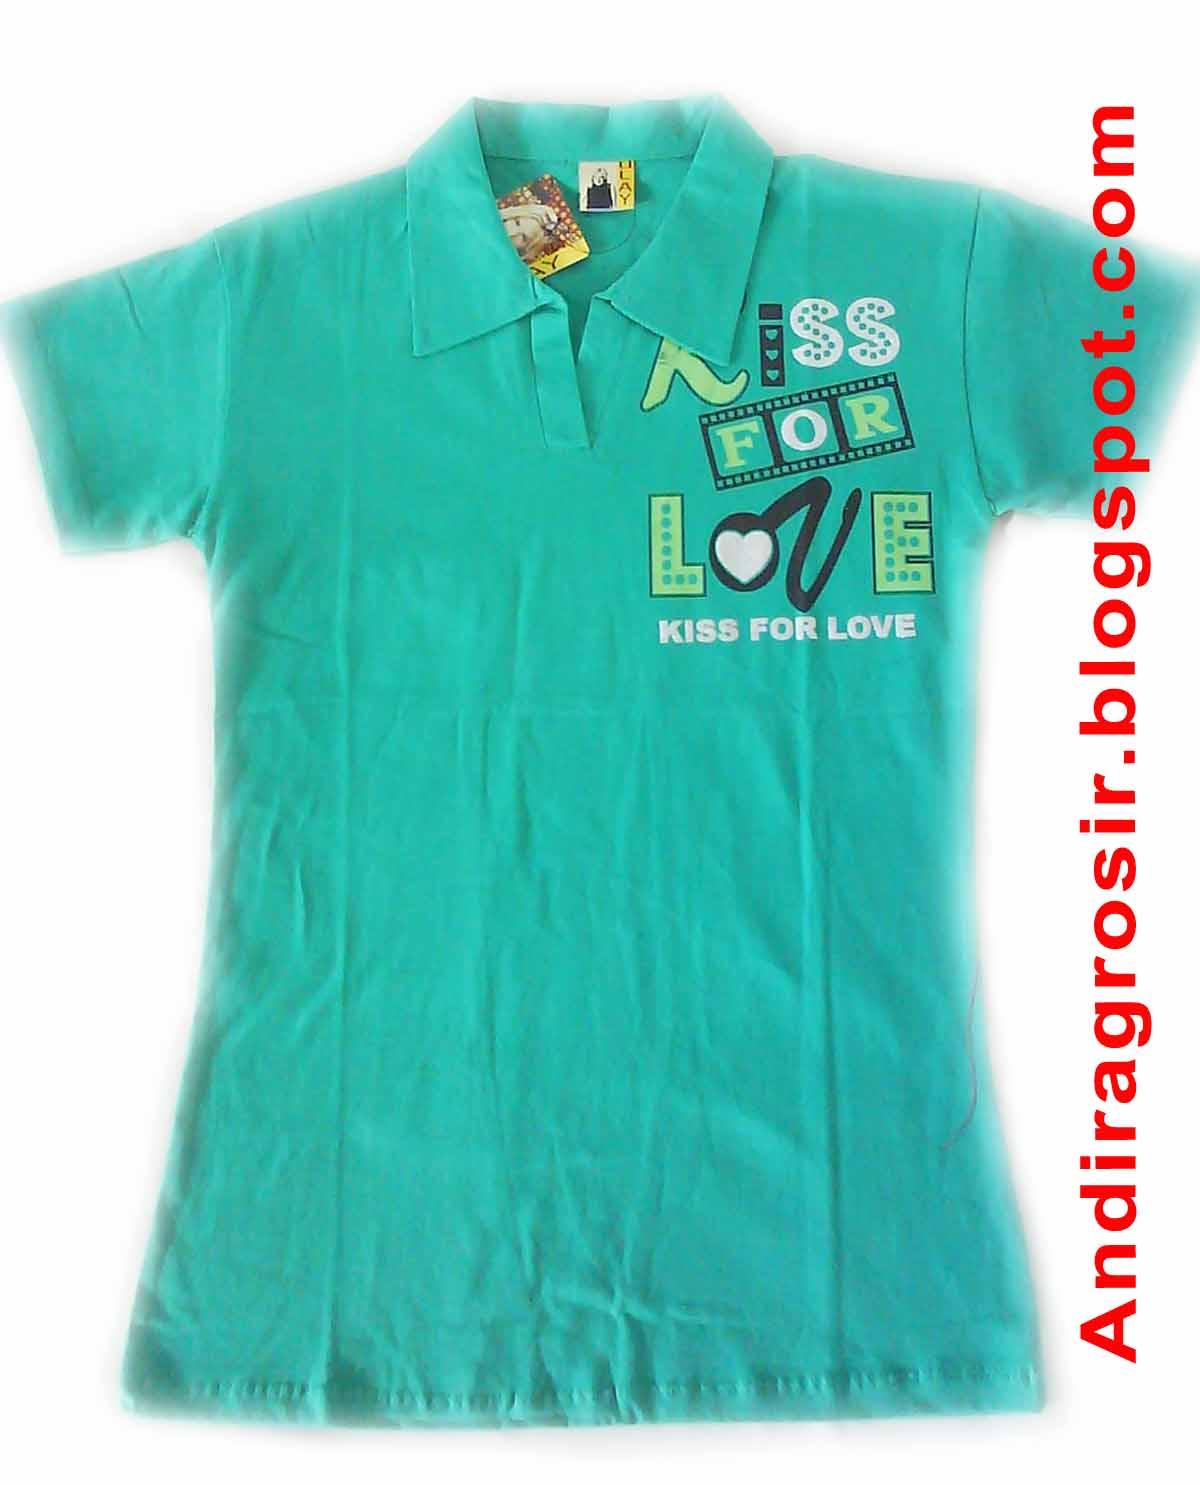 Harga Murah Kualitas Bagus September 2010grosir Baju Anak Kaos Singlet 2 Tahun 6 Pcs Mei Jie